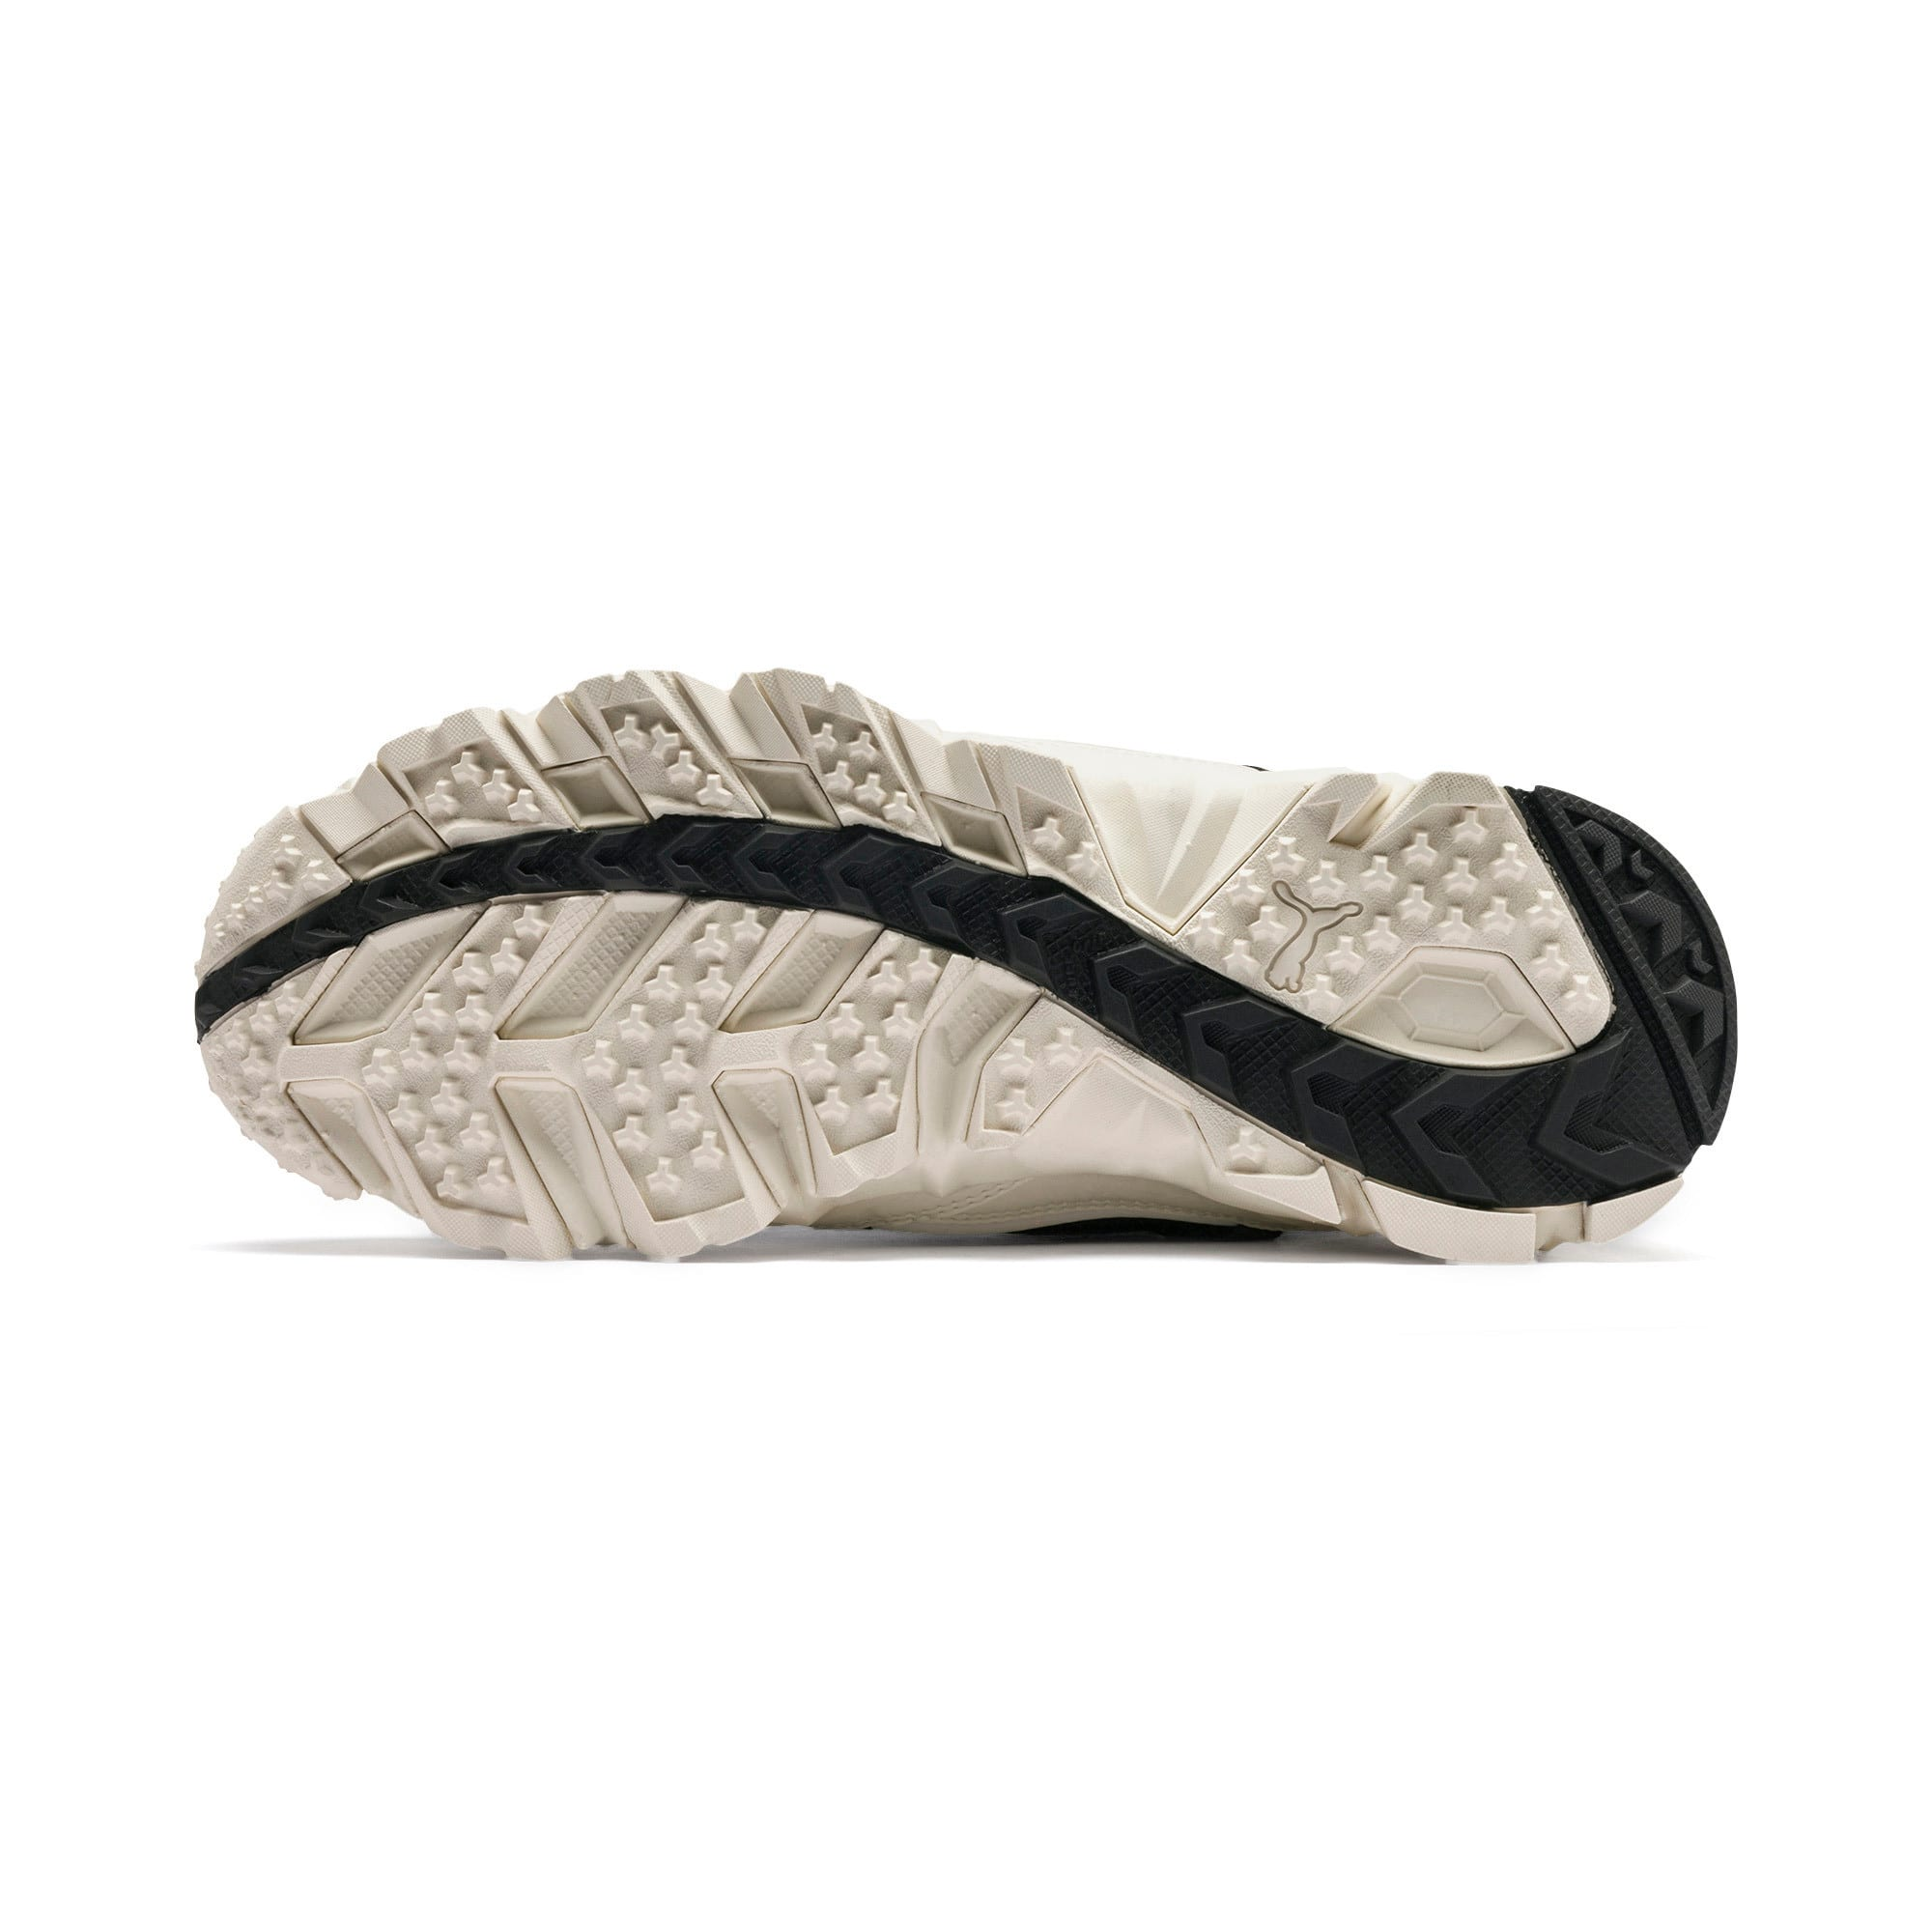 Thumbnail 5 of Trailfox Overland Sneakers, Puma Black-Whisper White, medium